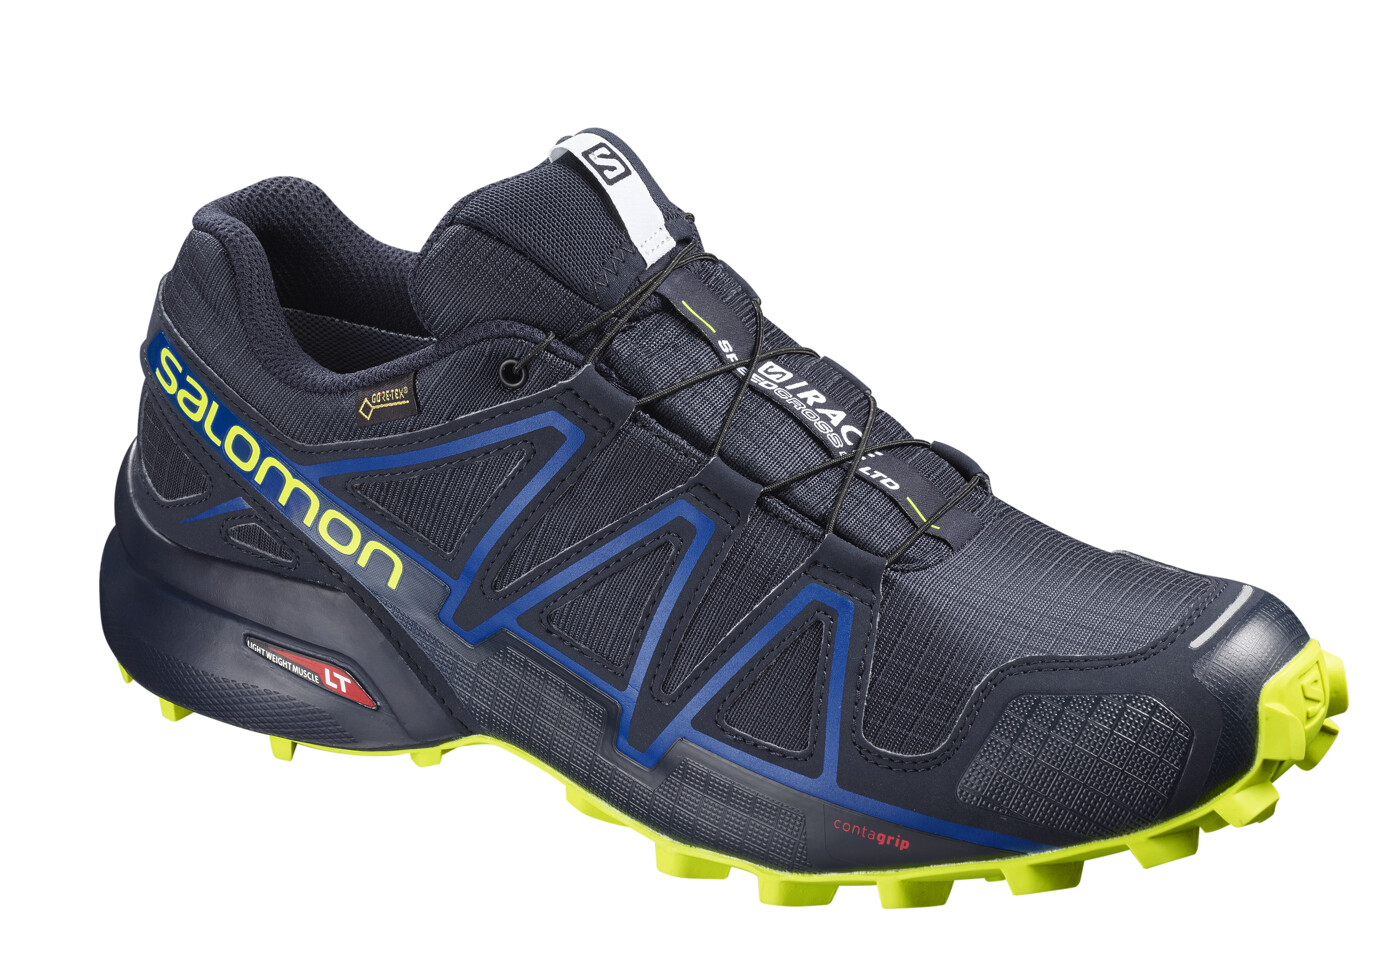 SALOMON Schuhe SPEEDCROSS 4 GTX - Herren